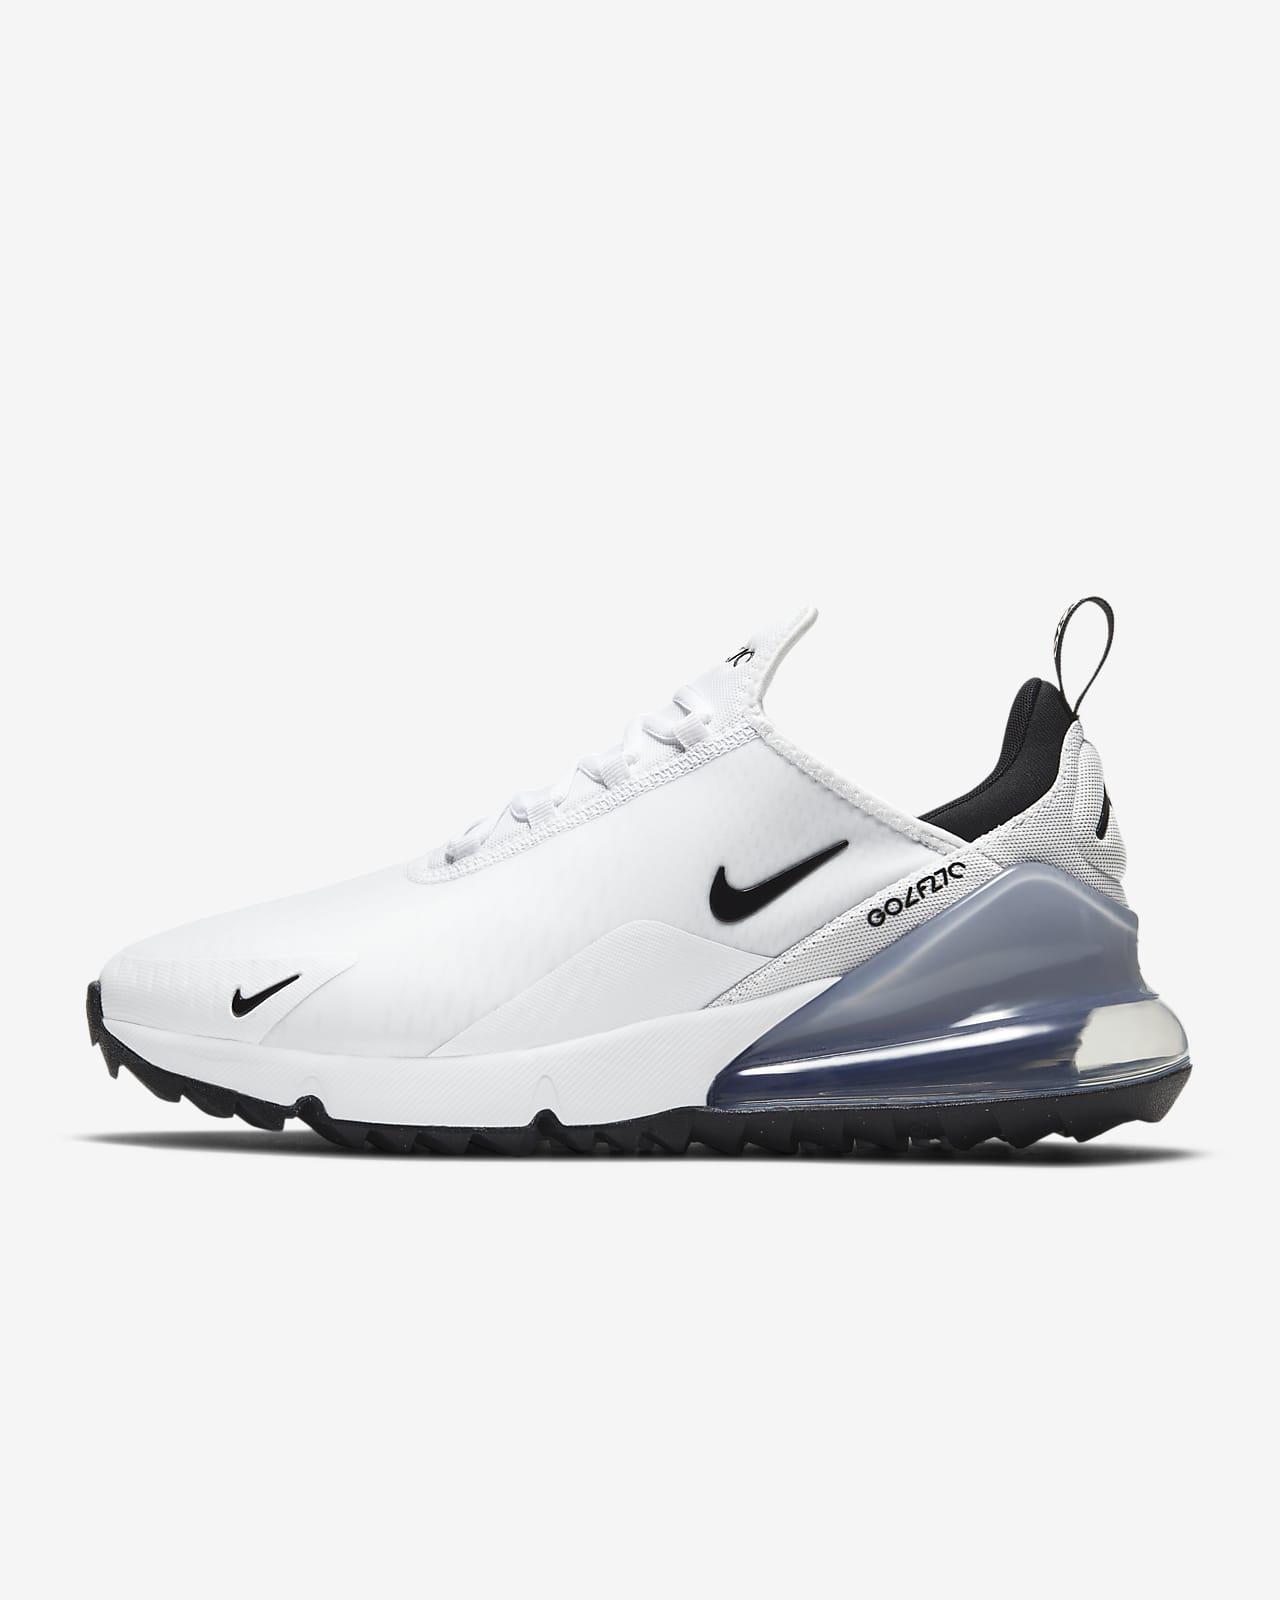 Golfová bota Nike Air Max 270 G